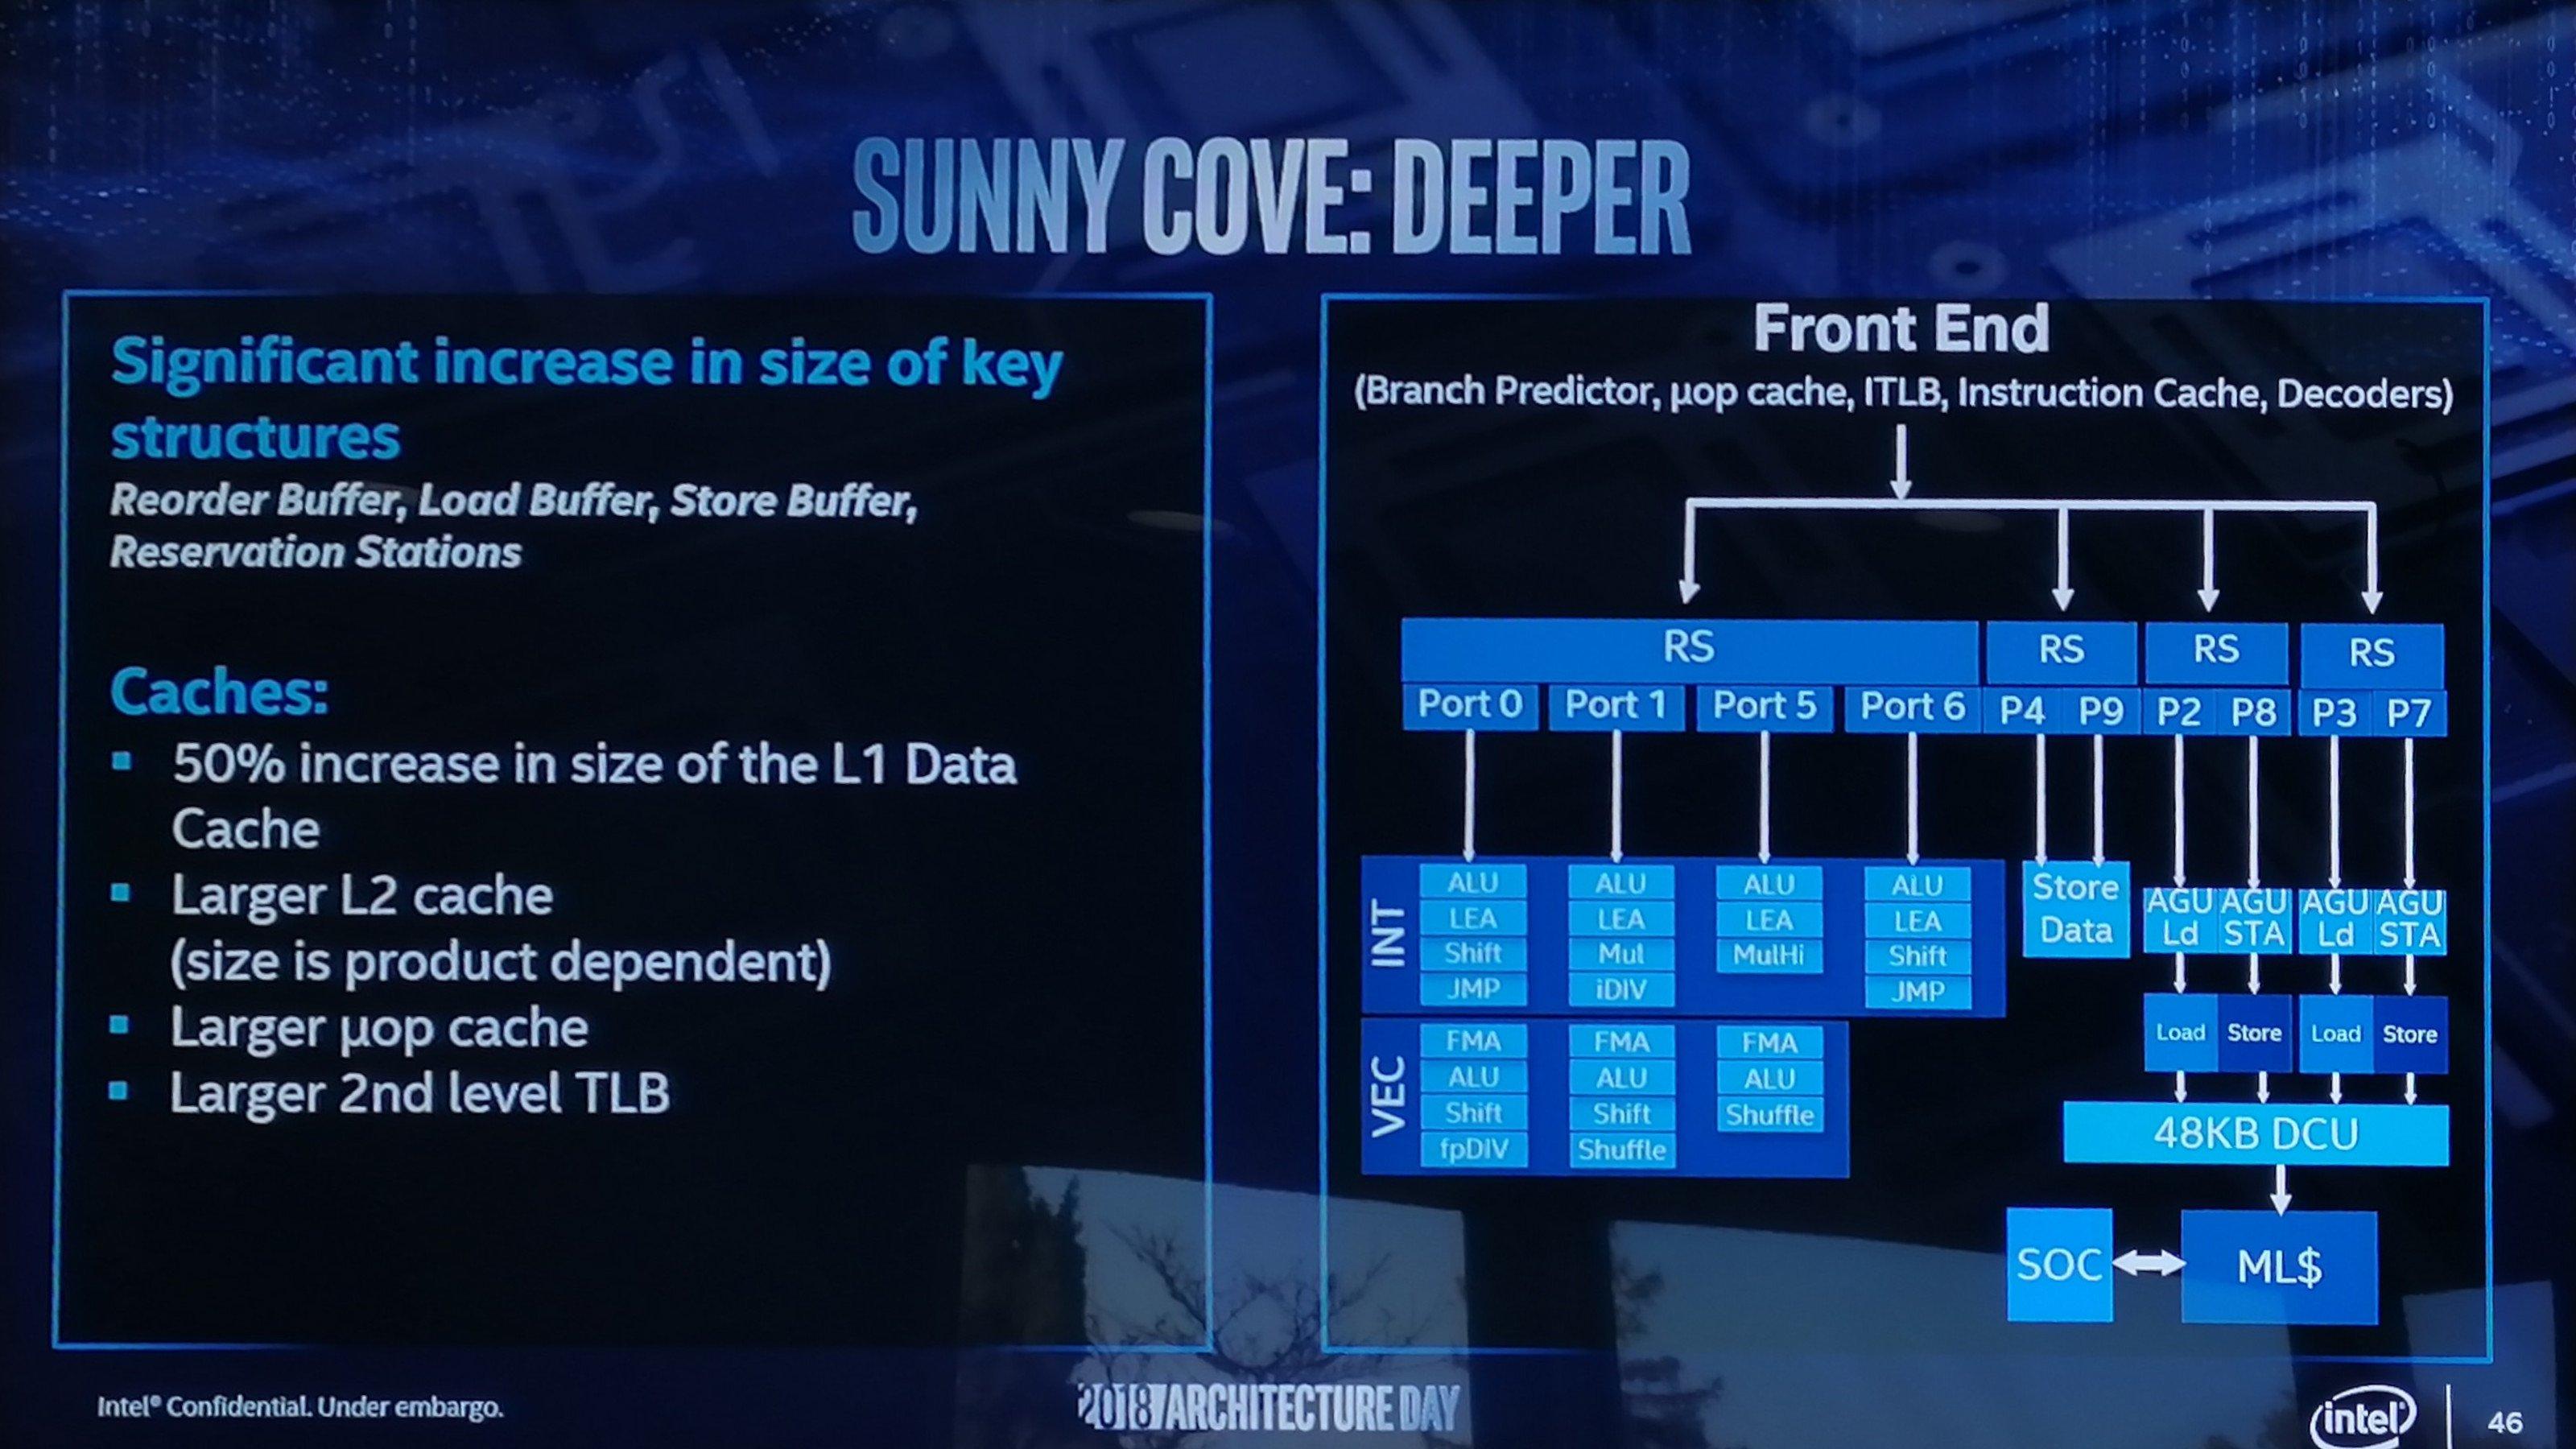 Architektura procesora Intel Sunny Cove